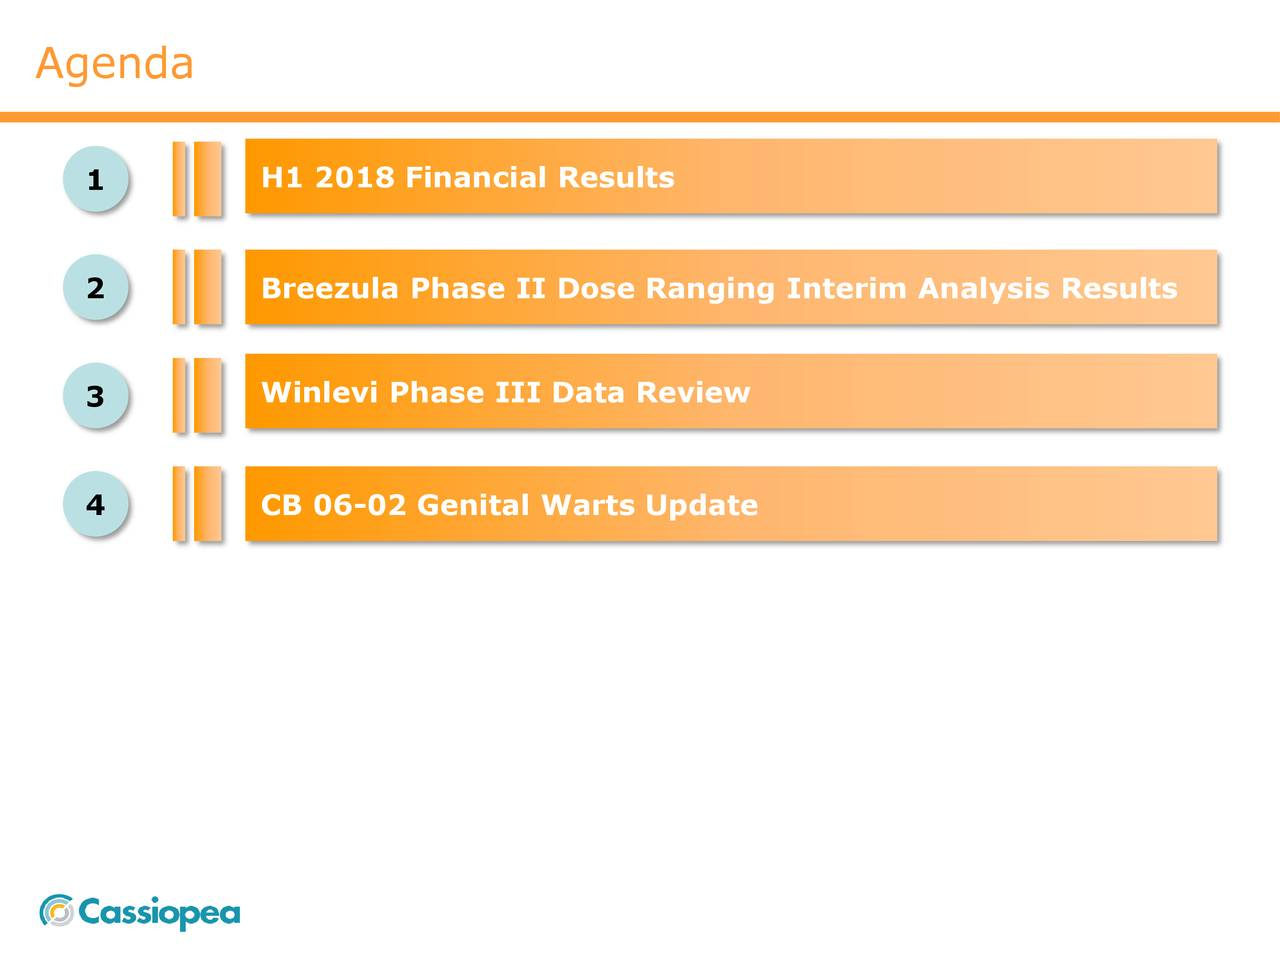 H1 2018 Financial Results 1 2 Breezula Phase II Dose Ranging Interim Analysis Results 3 Winlevi Phase III Data Review 4 CB 06-02 Genital Warts Update 28